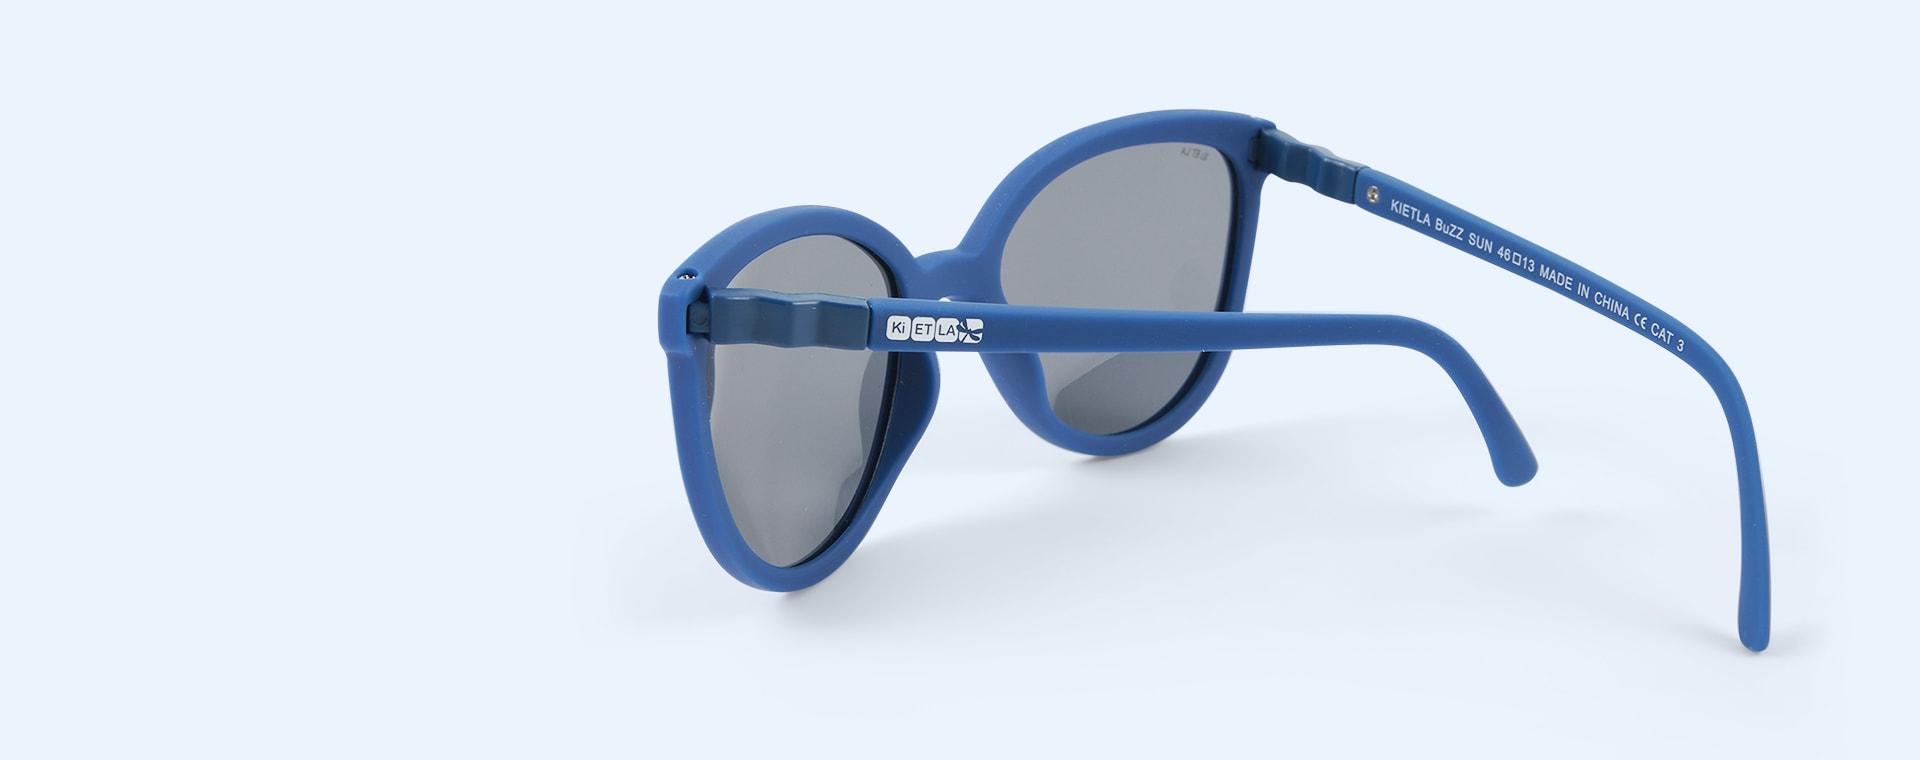 Denim Ki ET LA Crazyg-zag BUZZ Butterfly Sunglasses